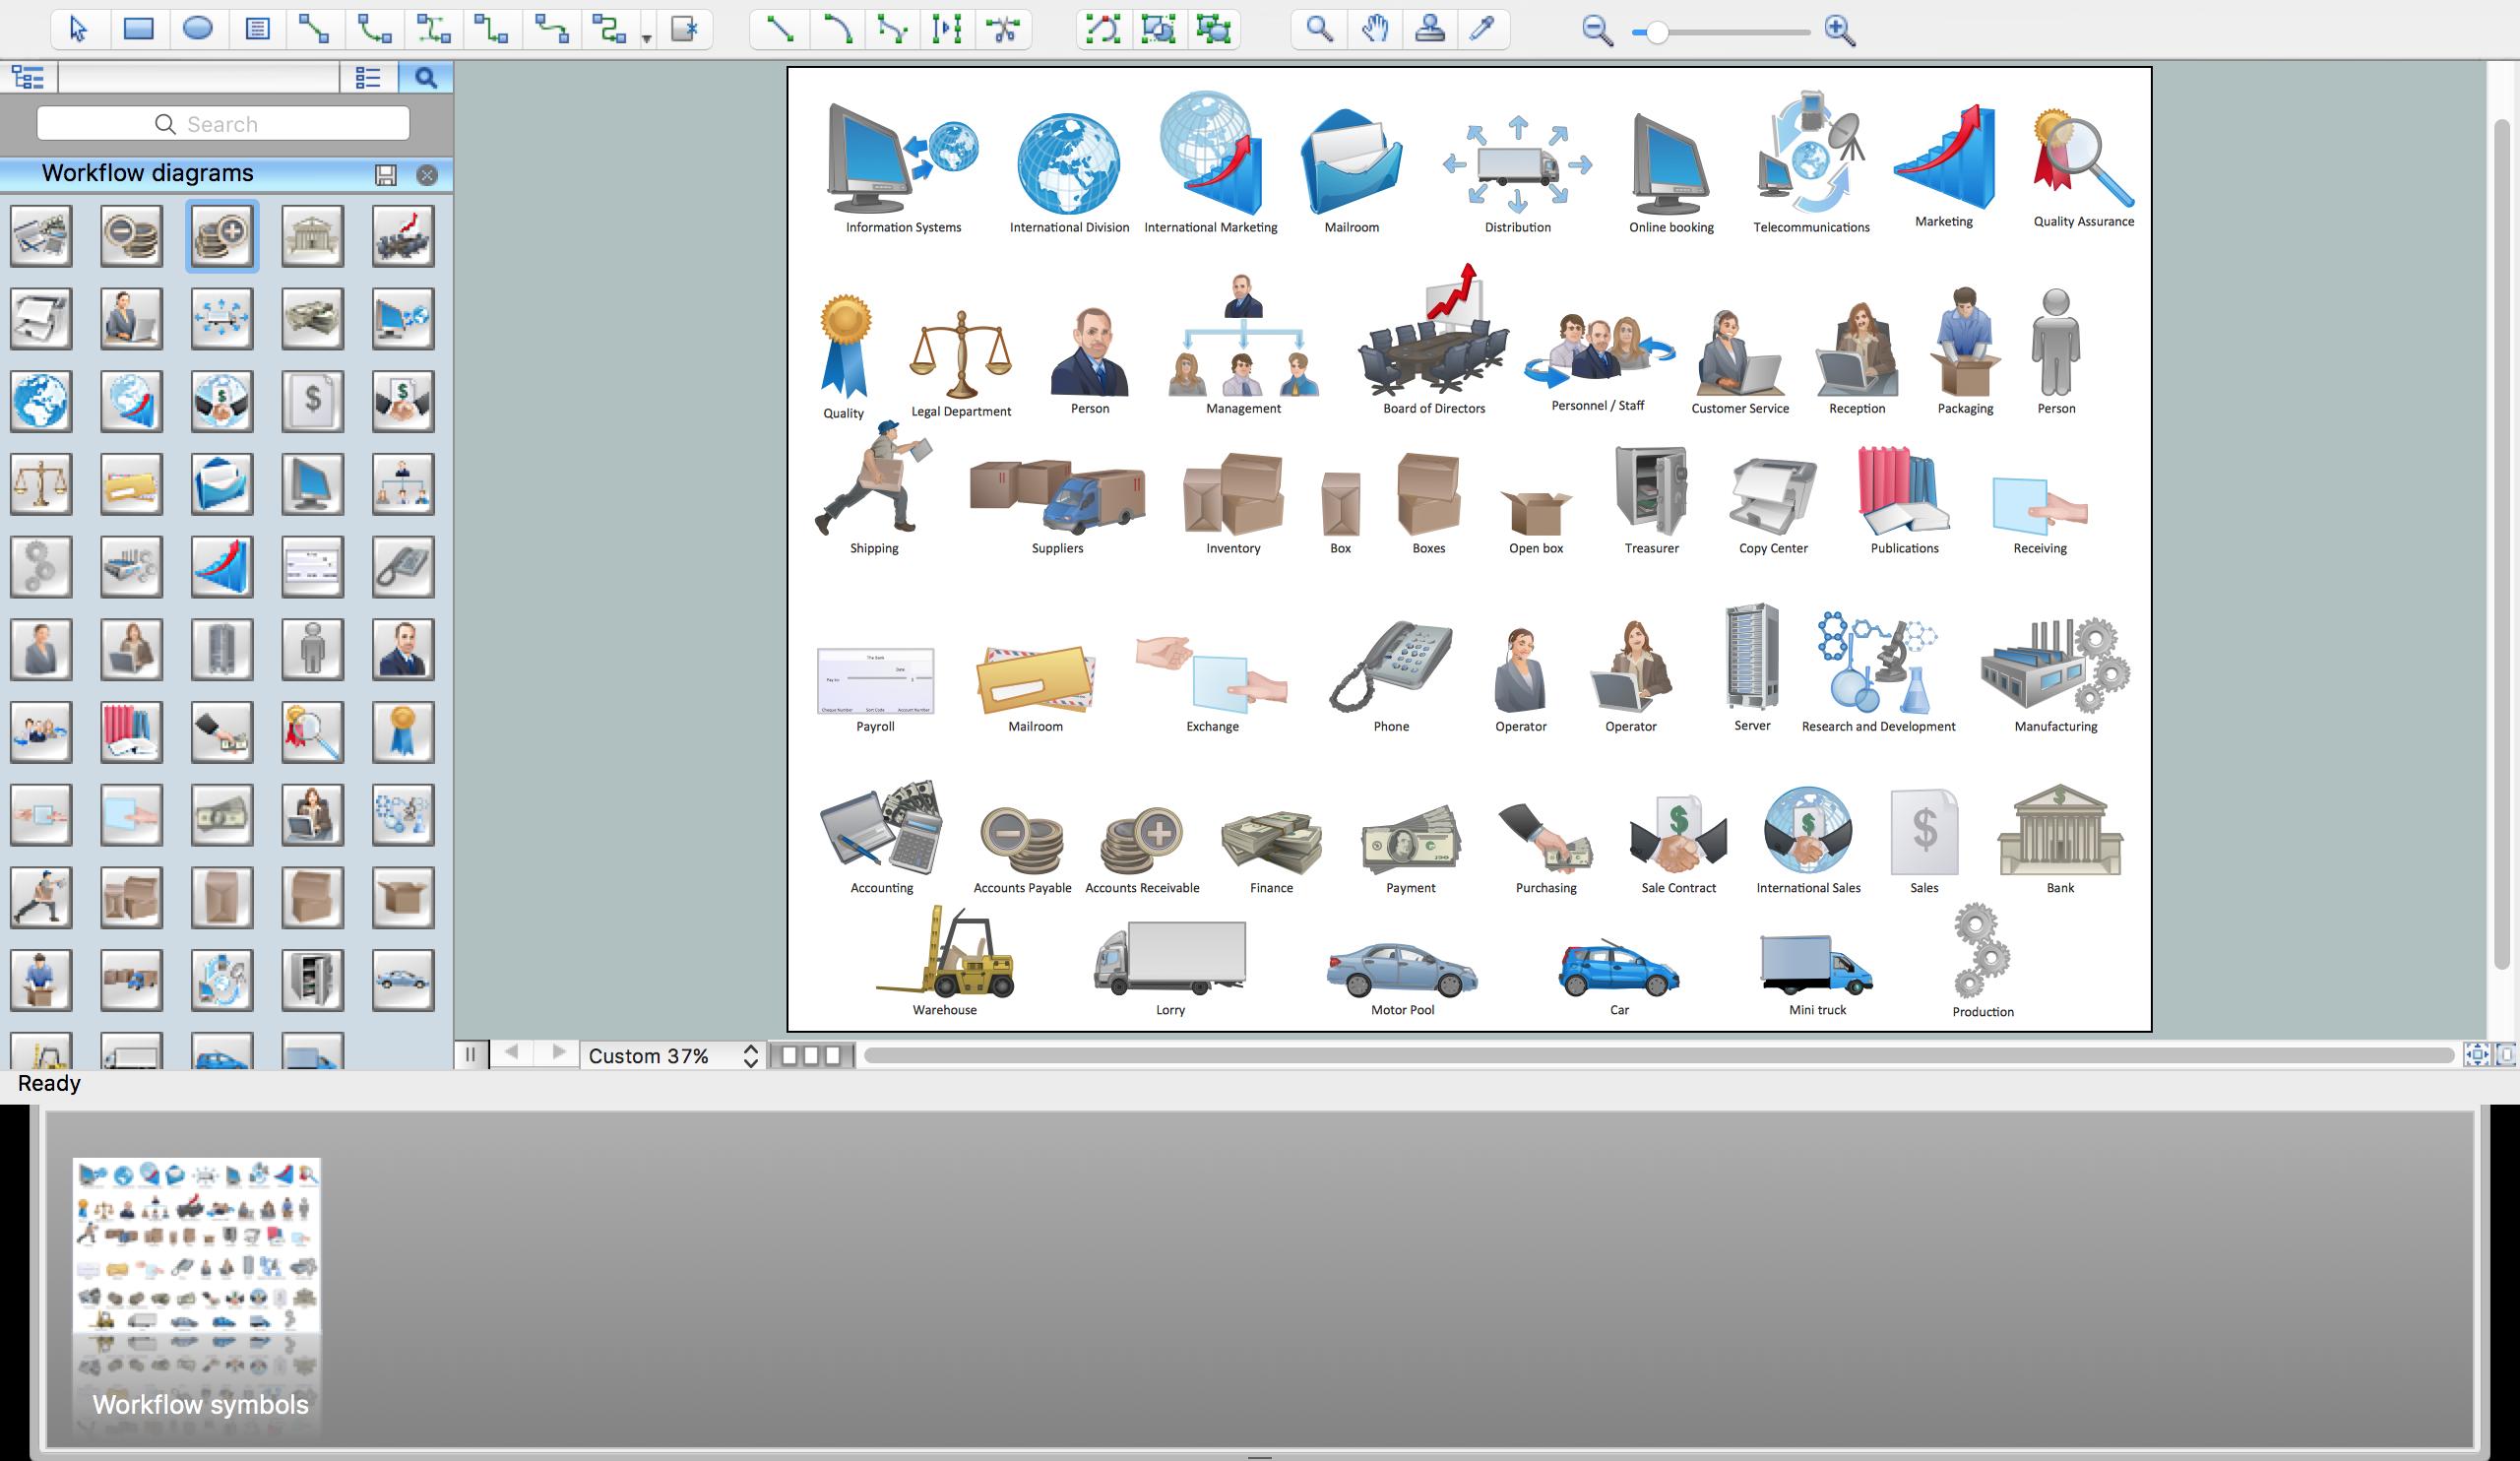 Workflow Flowchart Symbols *